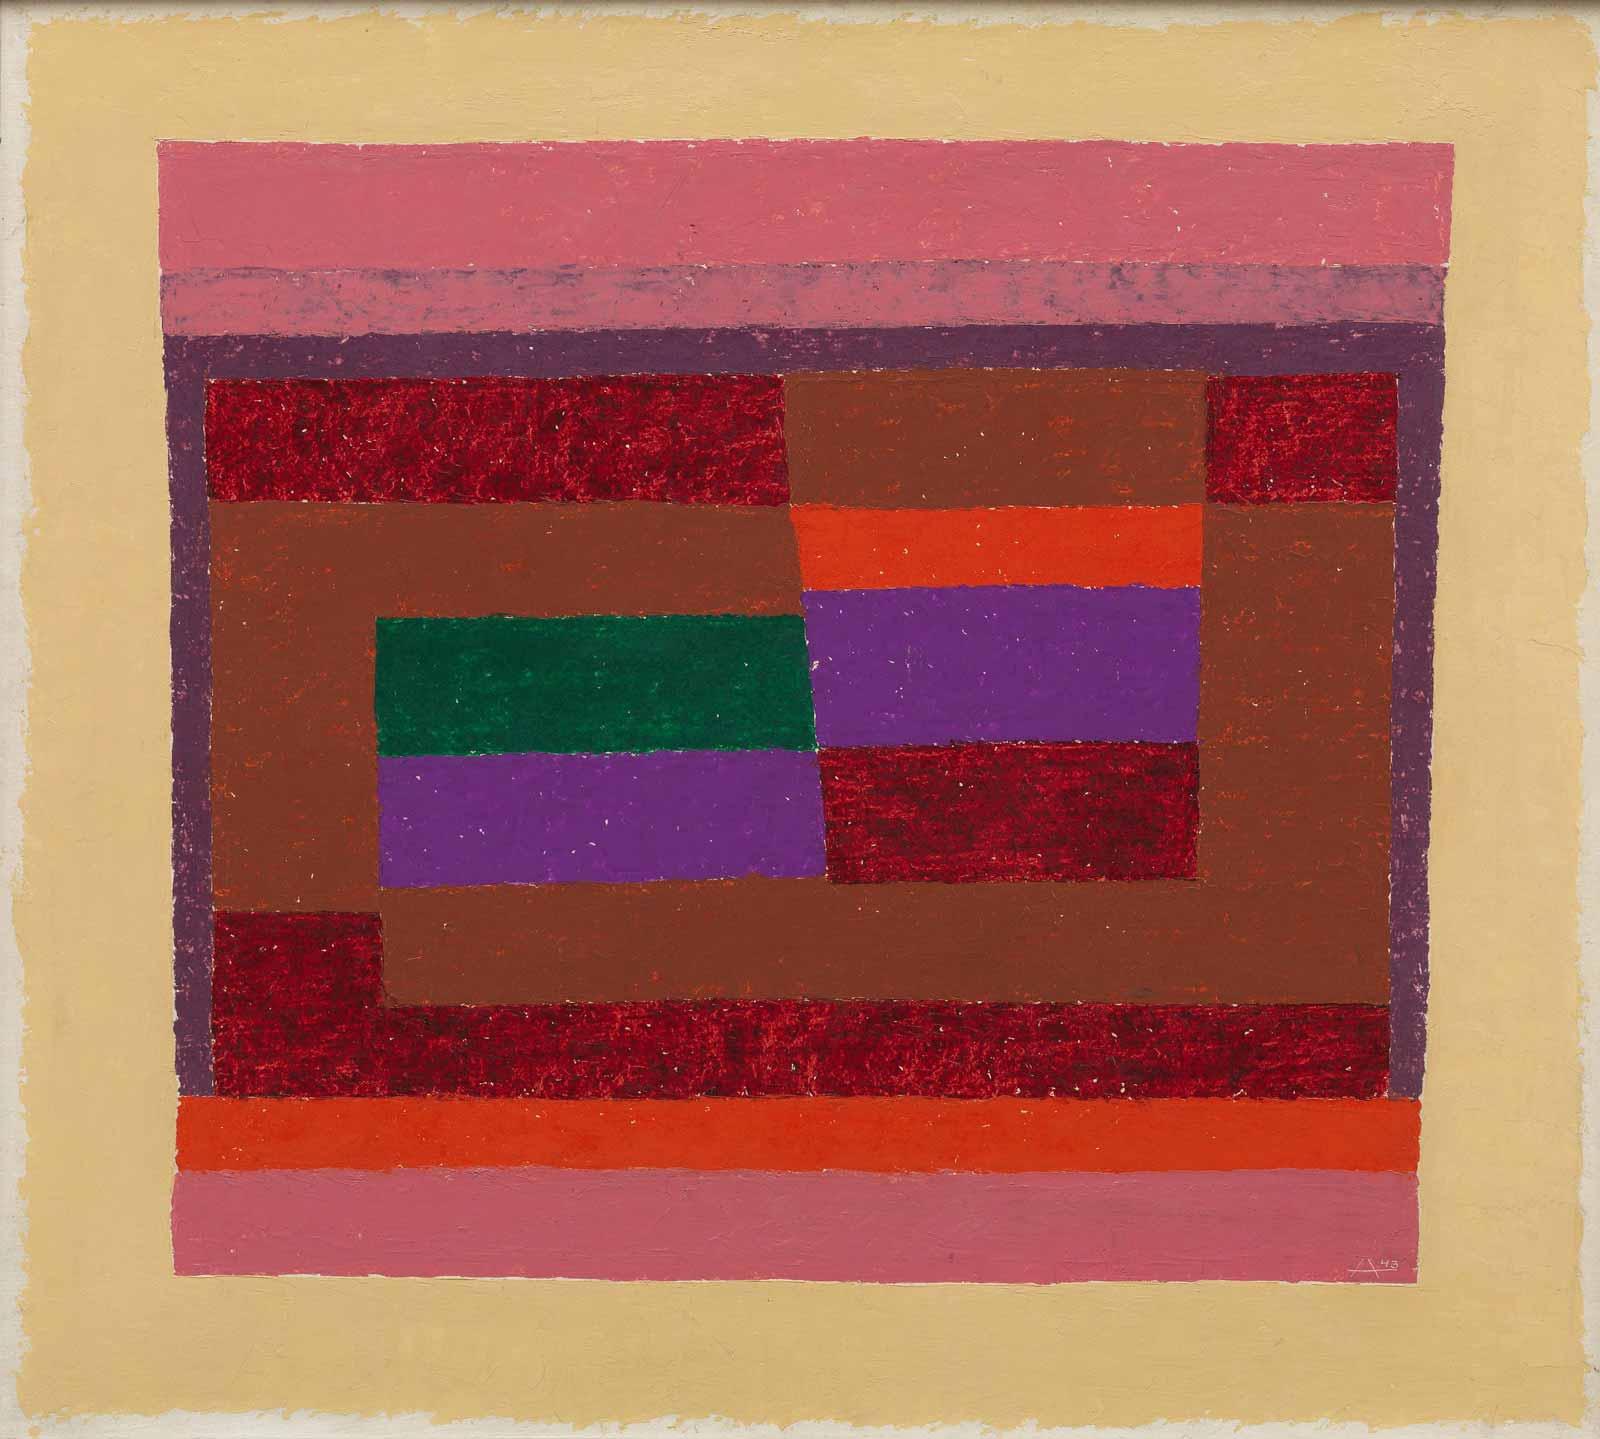 Josef Albers: Memento, 1943 (courtesy of the Guggenheim Museum/Estate of Karl Nierendorf)